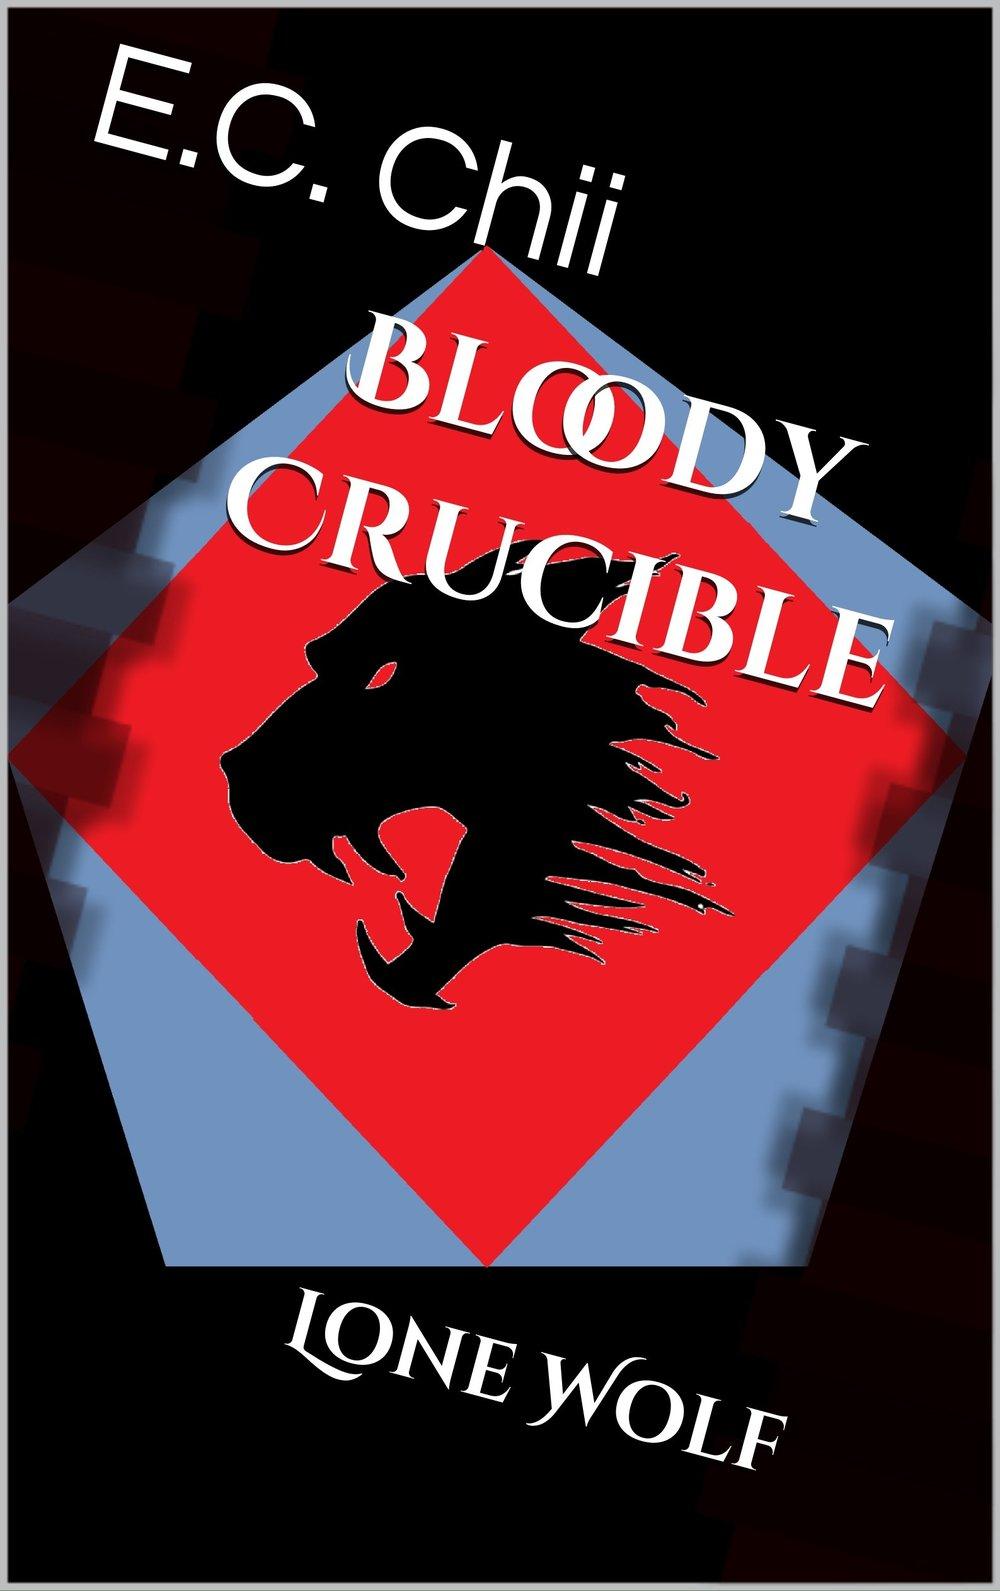 BloodyCrucible.jpg